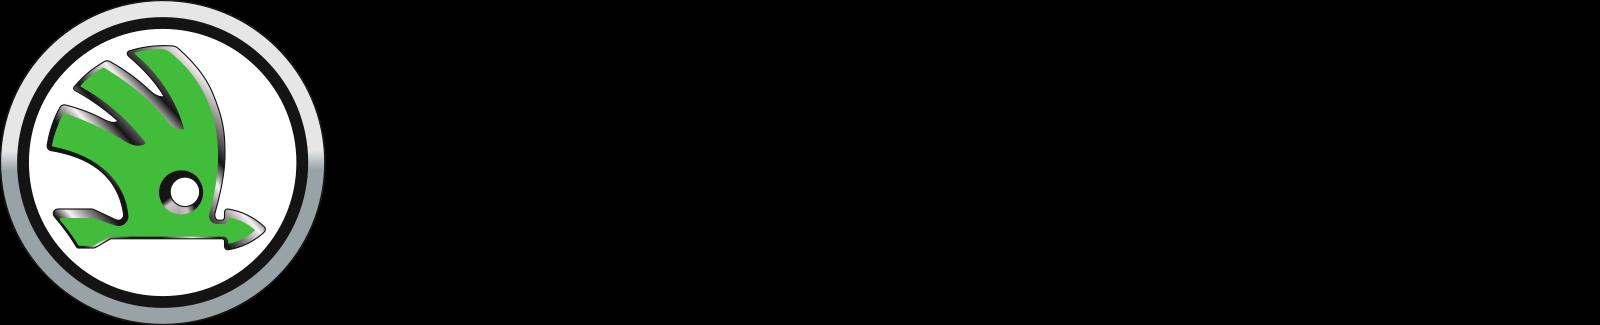 Škoda Auto logo.